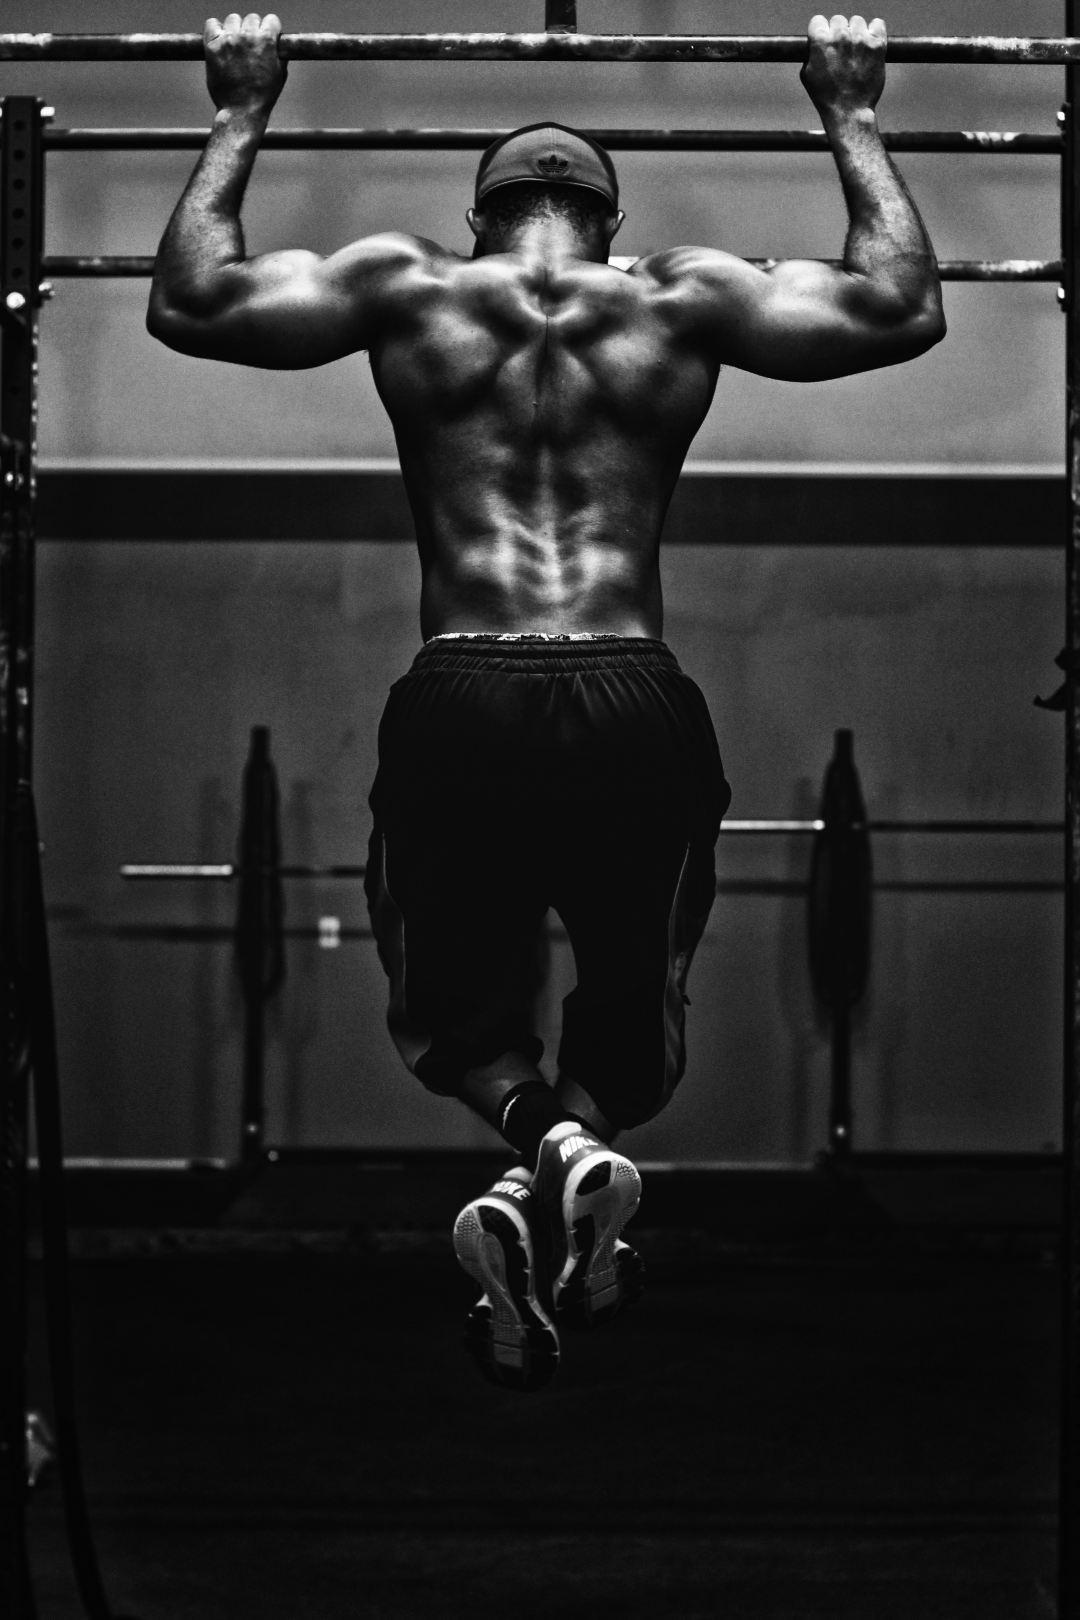 Gym Hq Free Unsplash